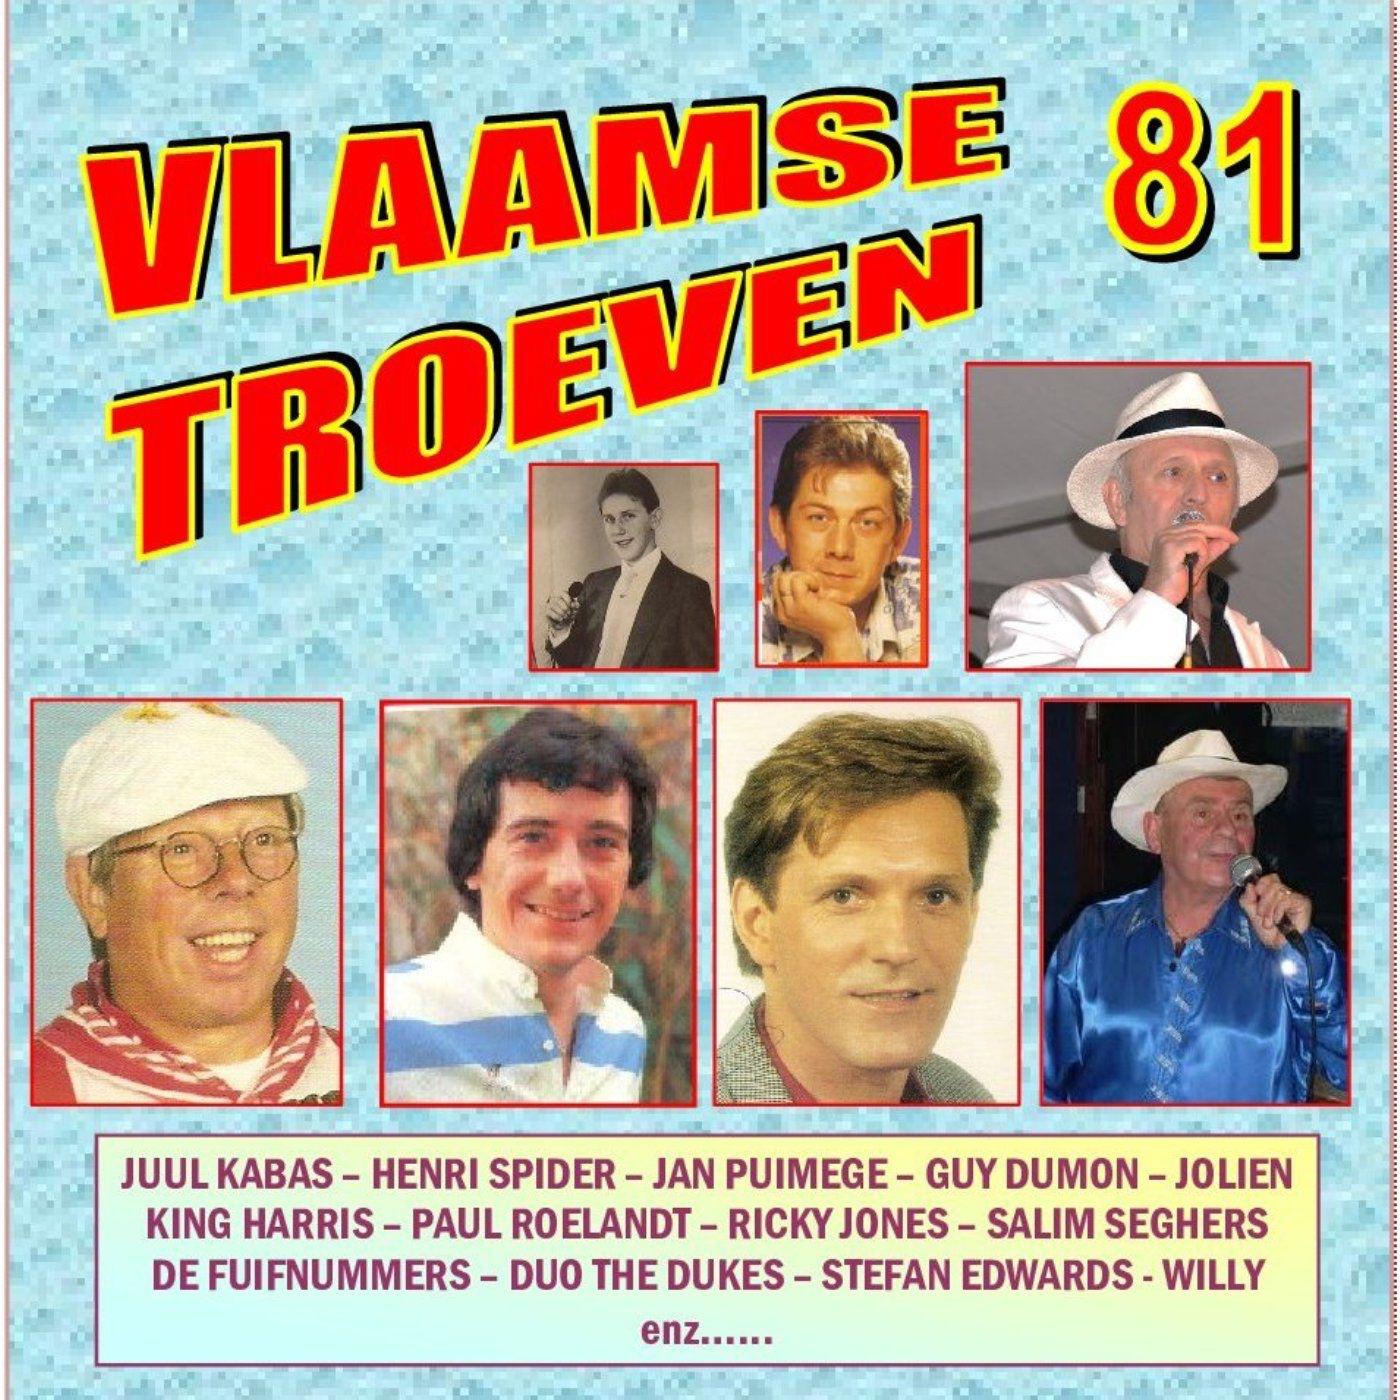 Vlaamse Troeven volume 81